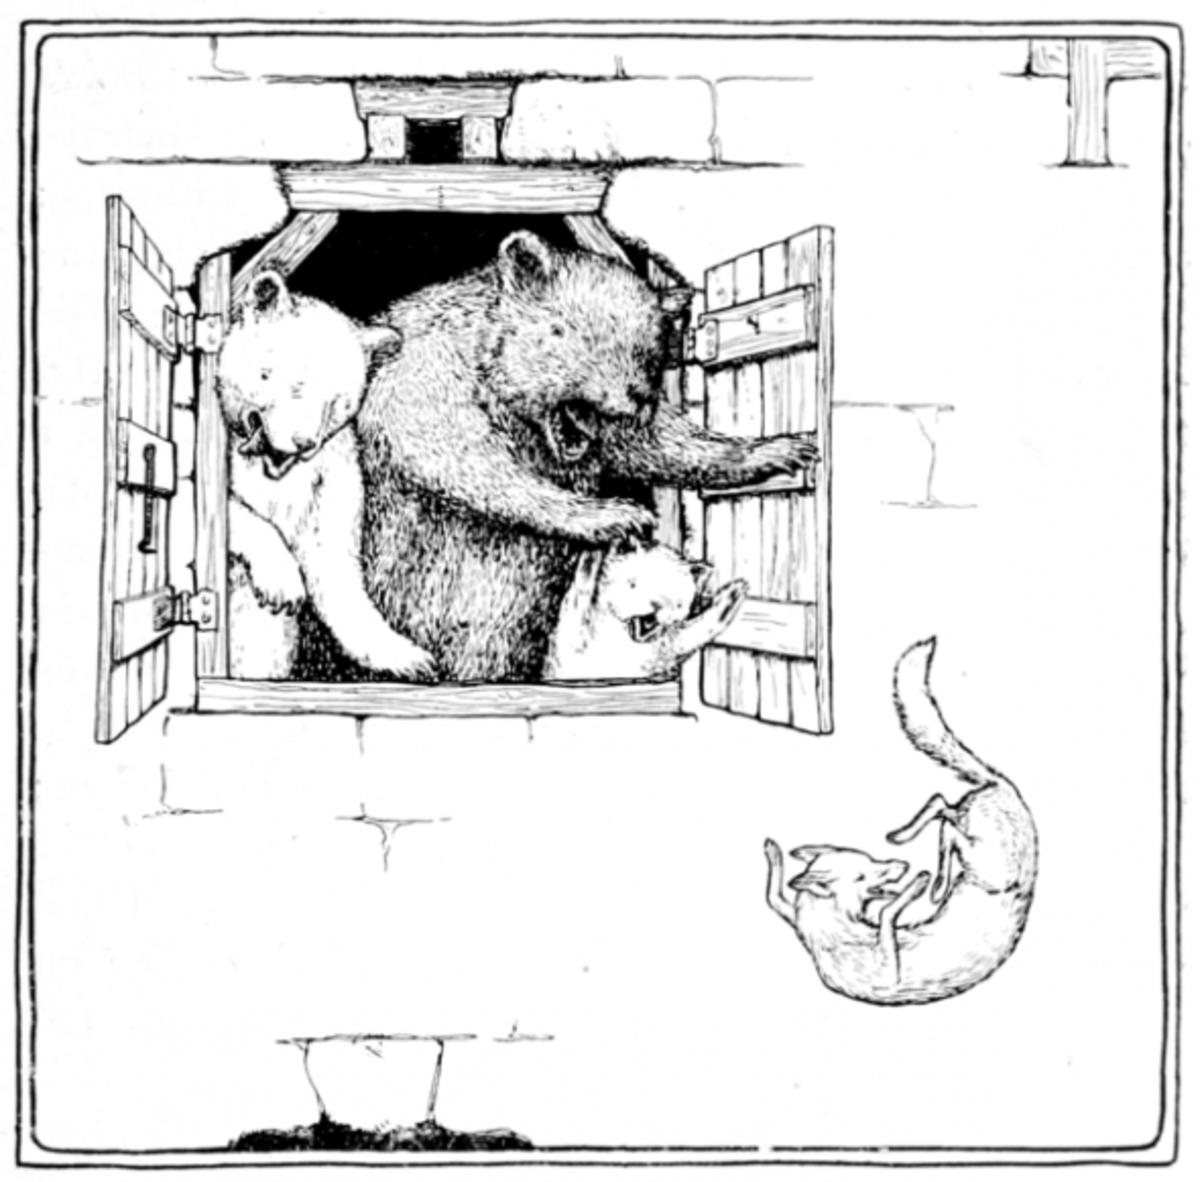 Three Bears by John Dixon Batten